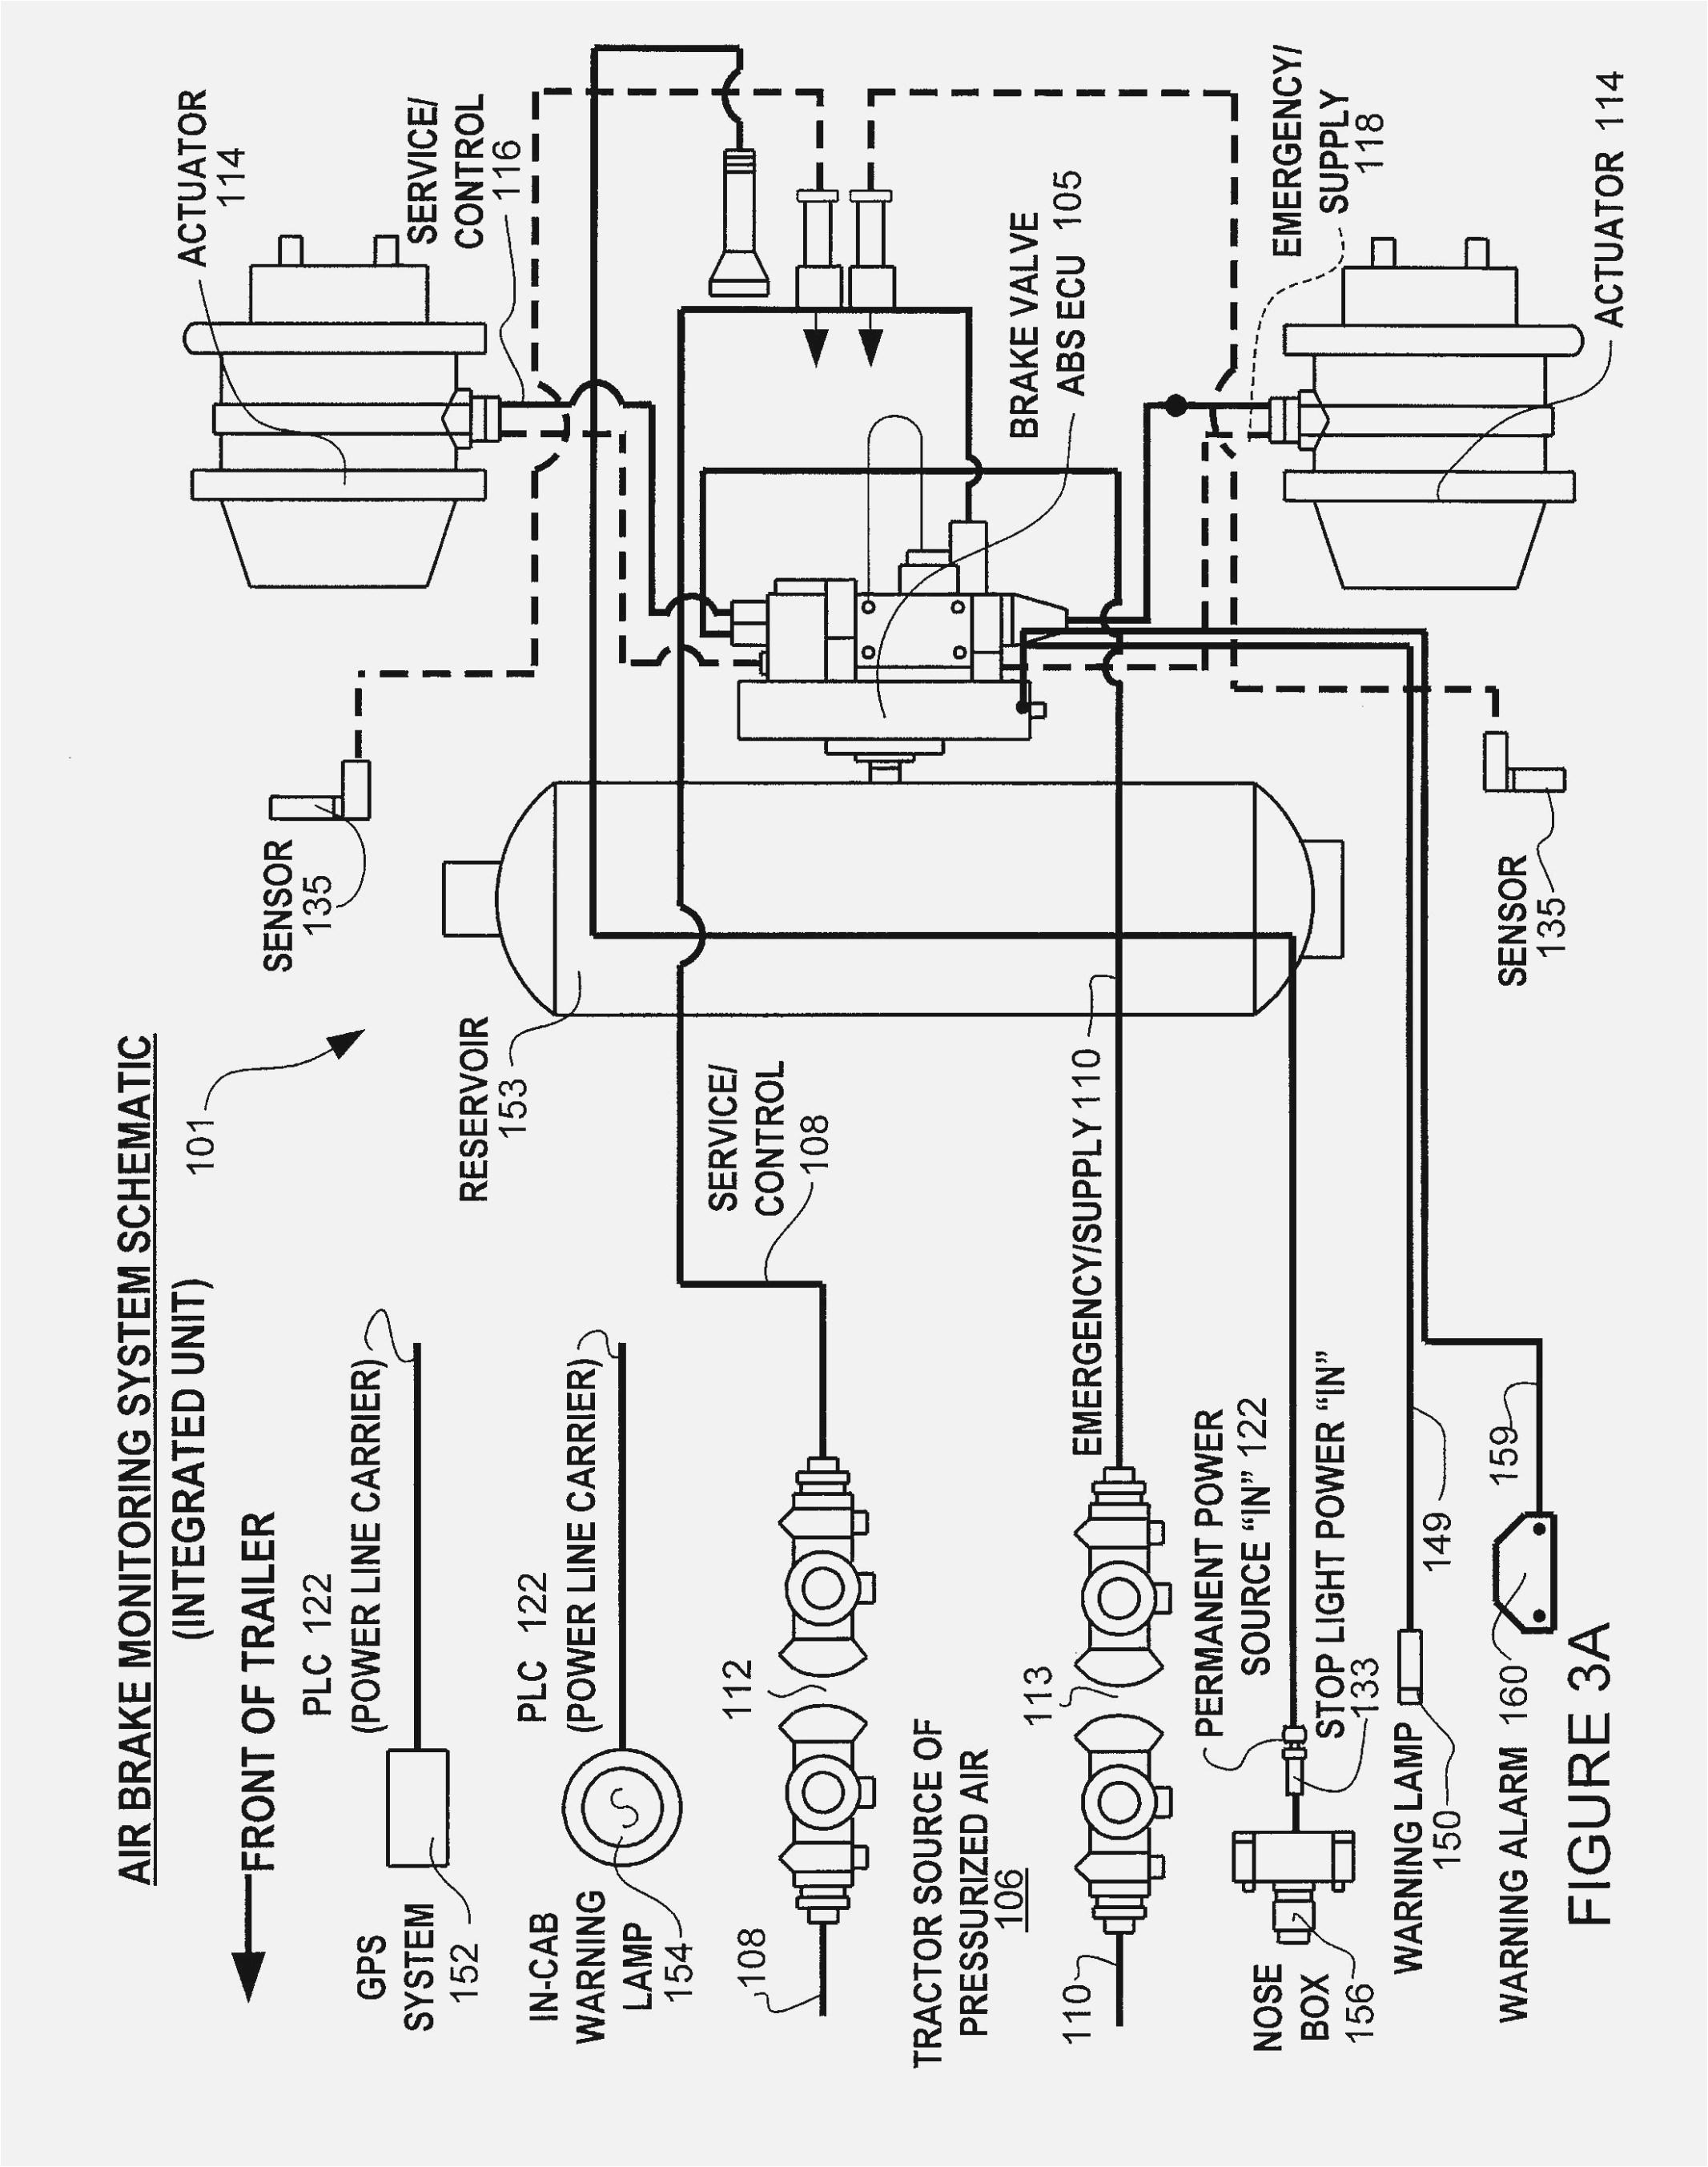 2009 chevy silverado abs wiring diagram wiring diagram article diagram likewise 2001 chevy tahoe blend door actuator diagram on 2002